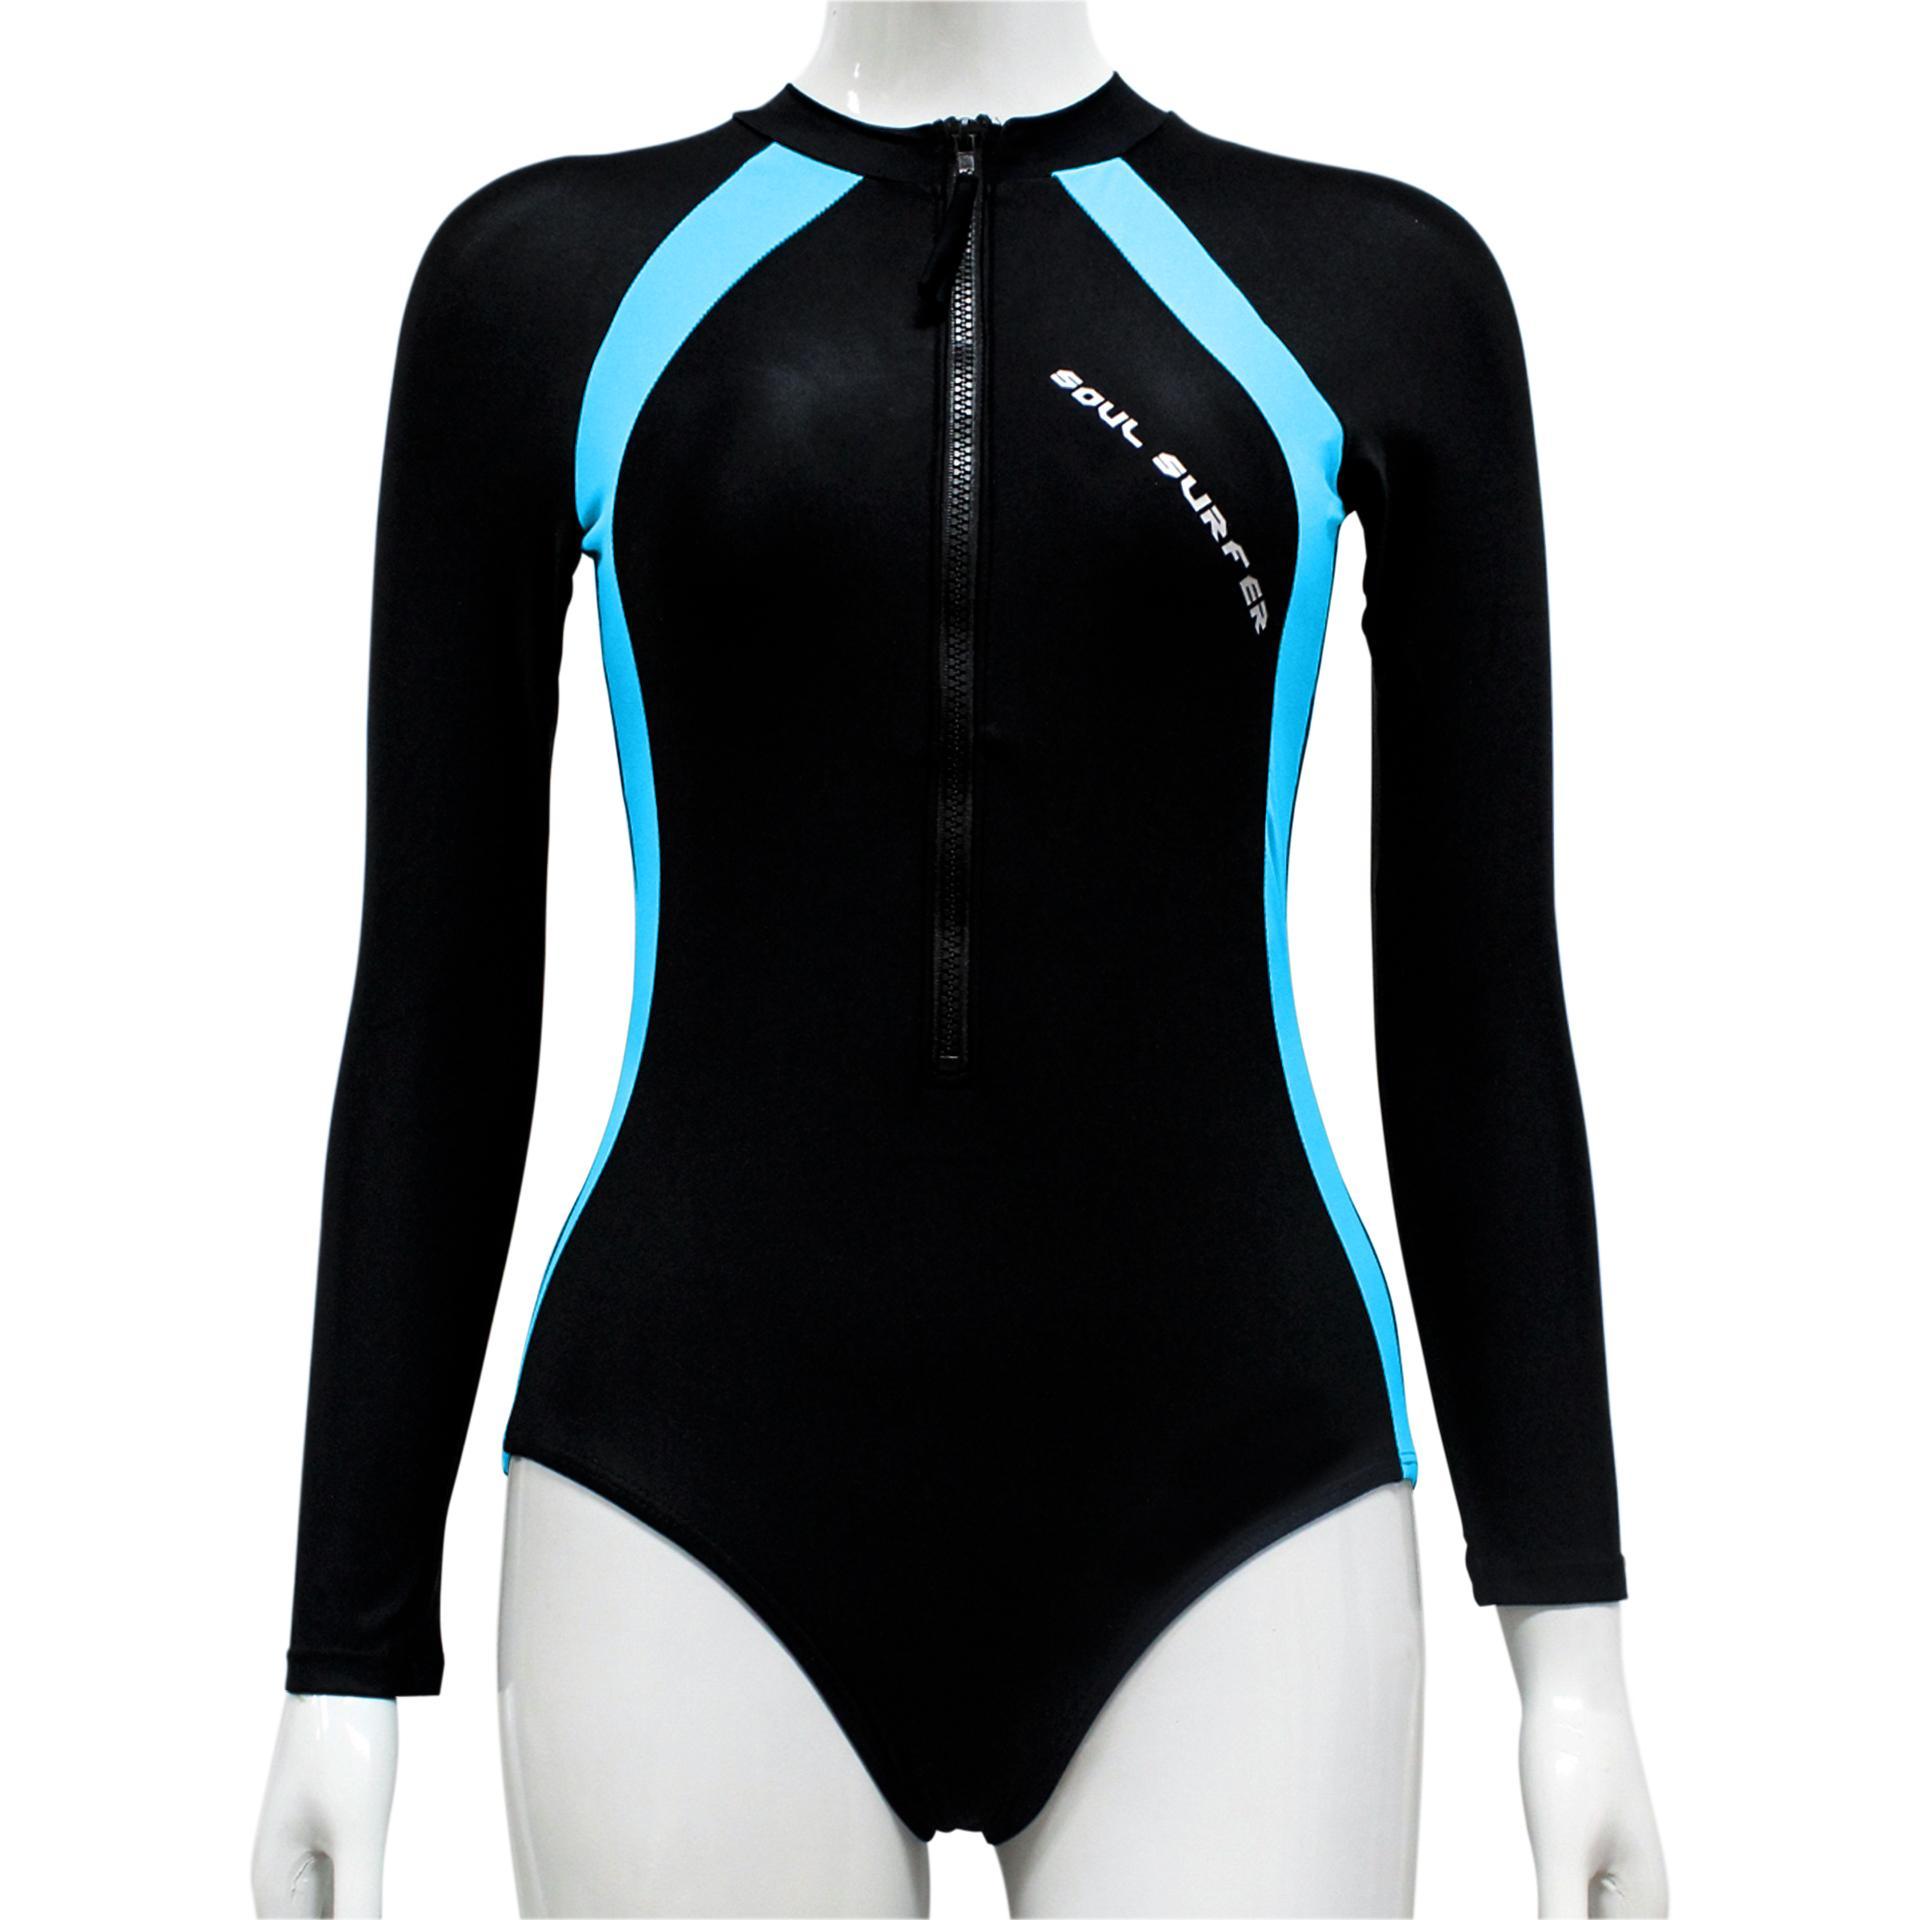 1893ee16ef79 Misfit Swim DSN# MFR001 Women's Overall Long Sleeve Sun-Proof One Piece  Rash Guard